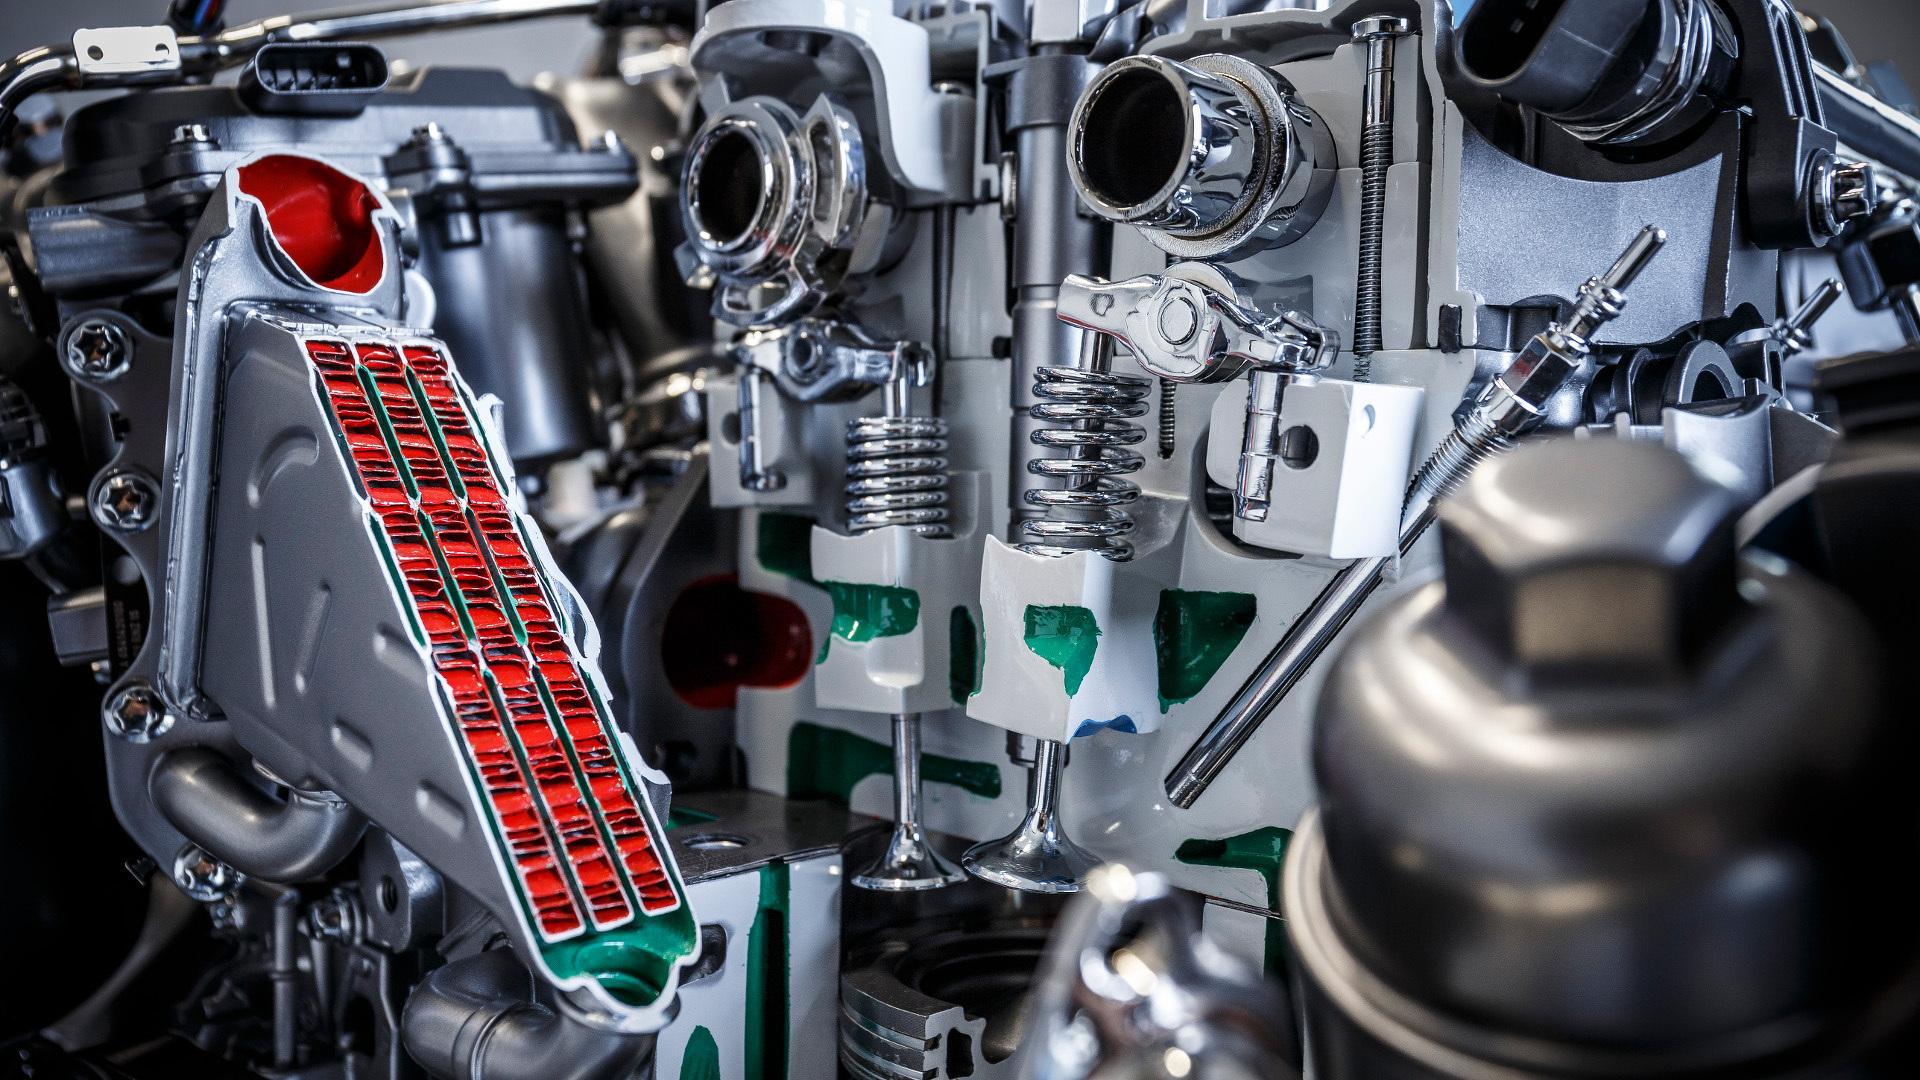 mercedes benz engines top maintenance diesel cdi car german sheffield bottom